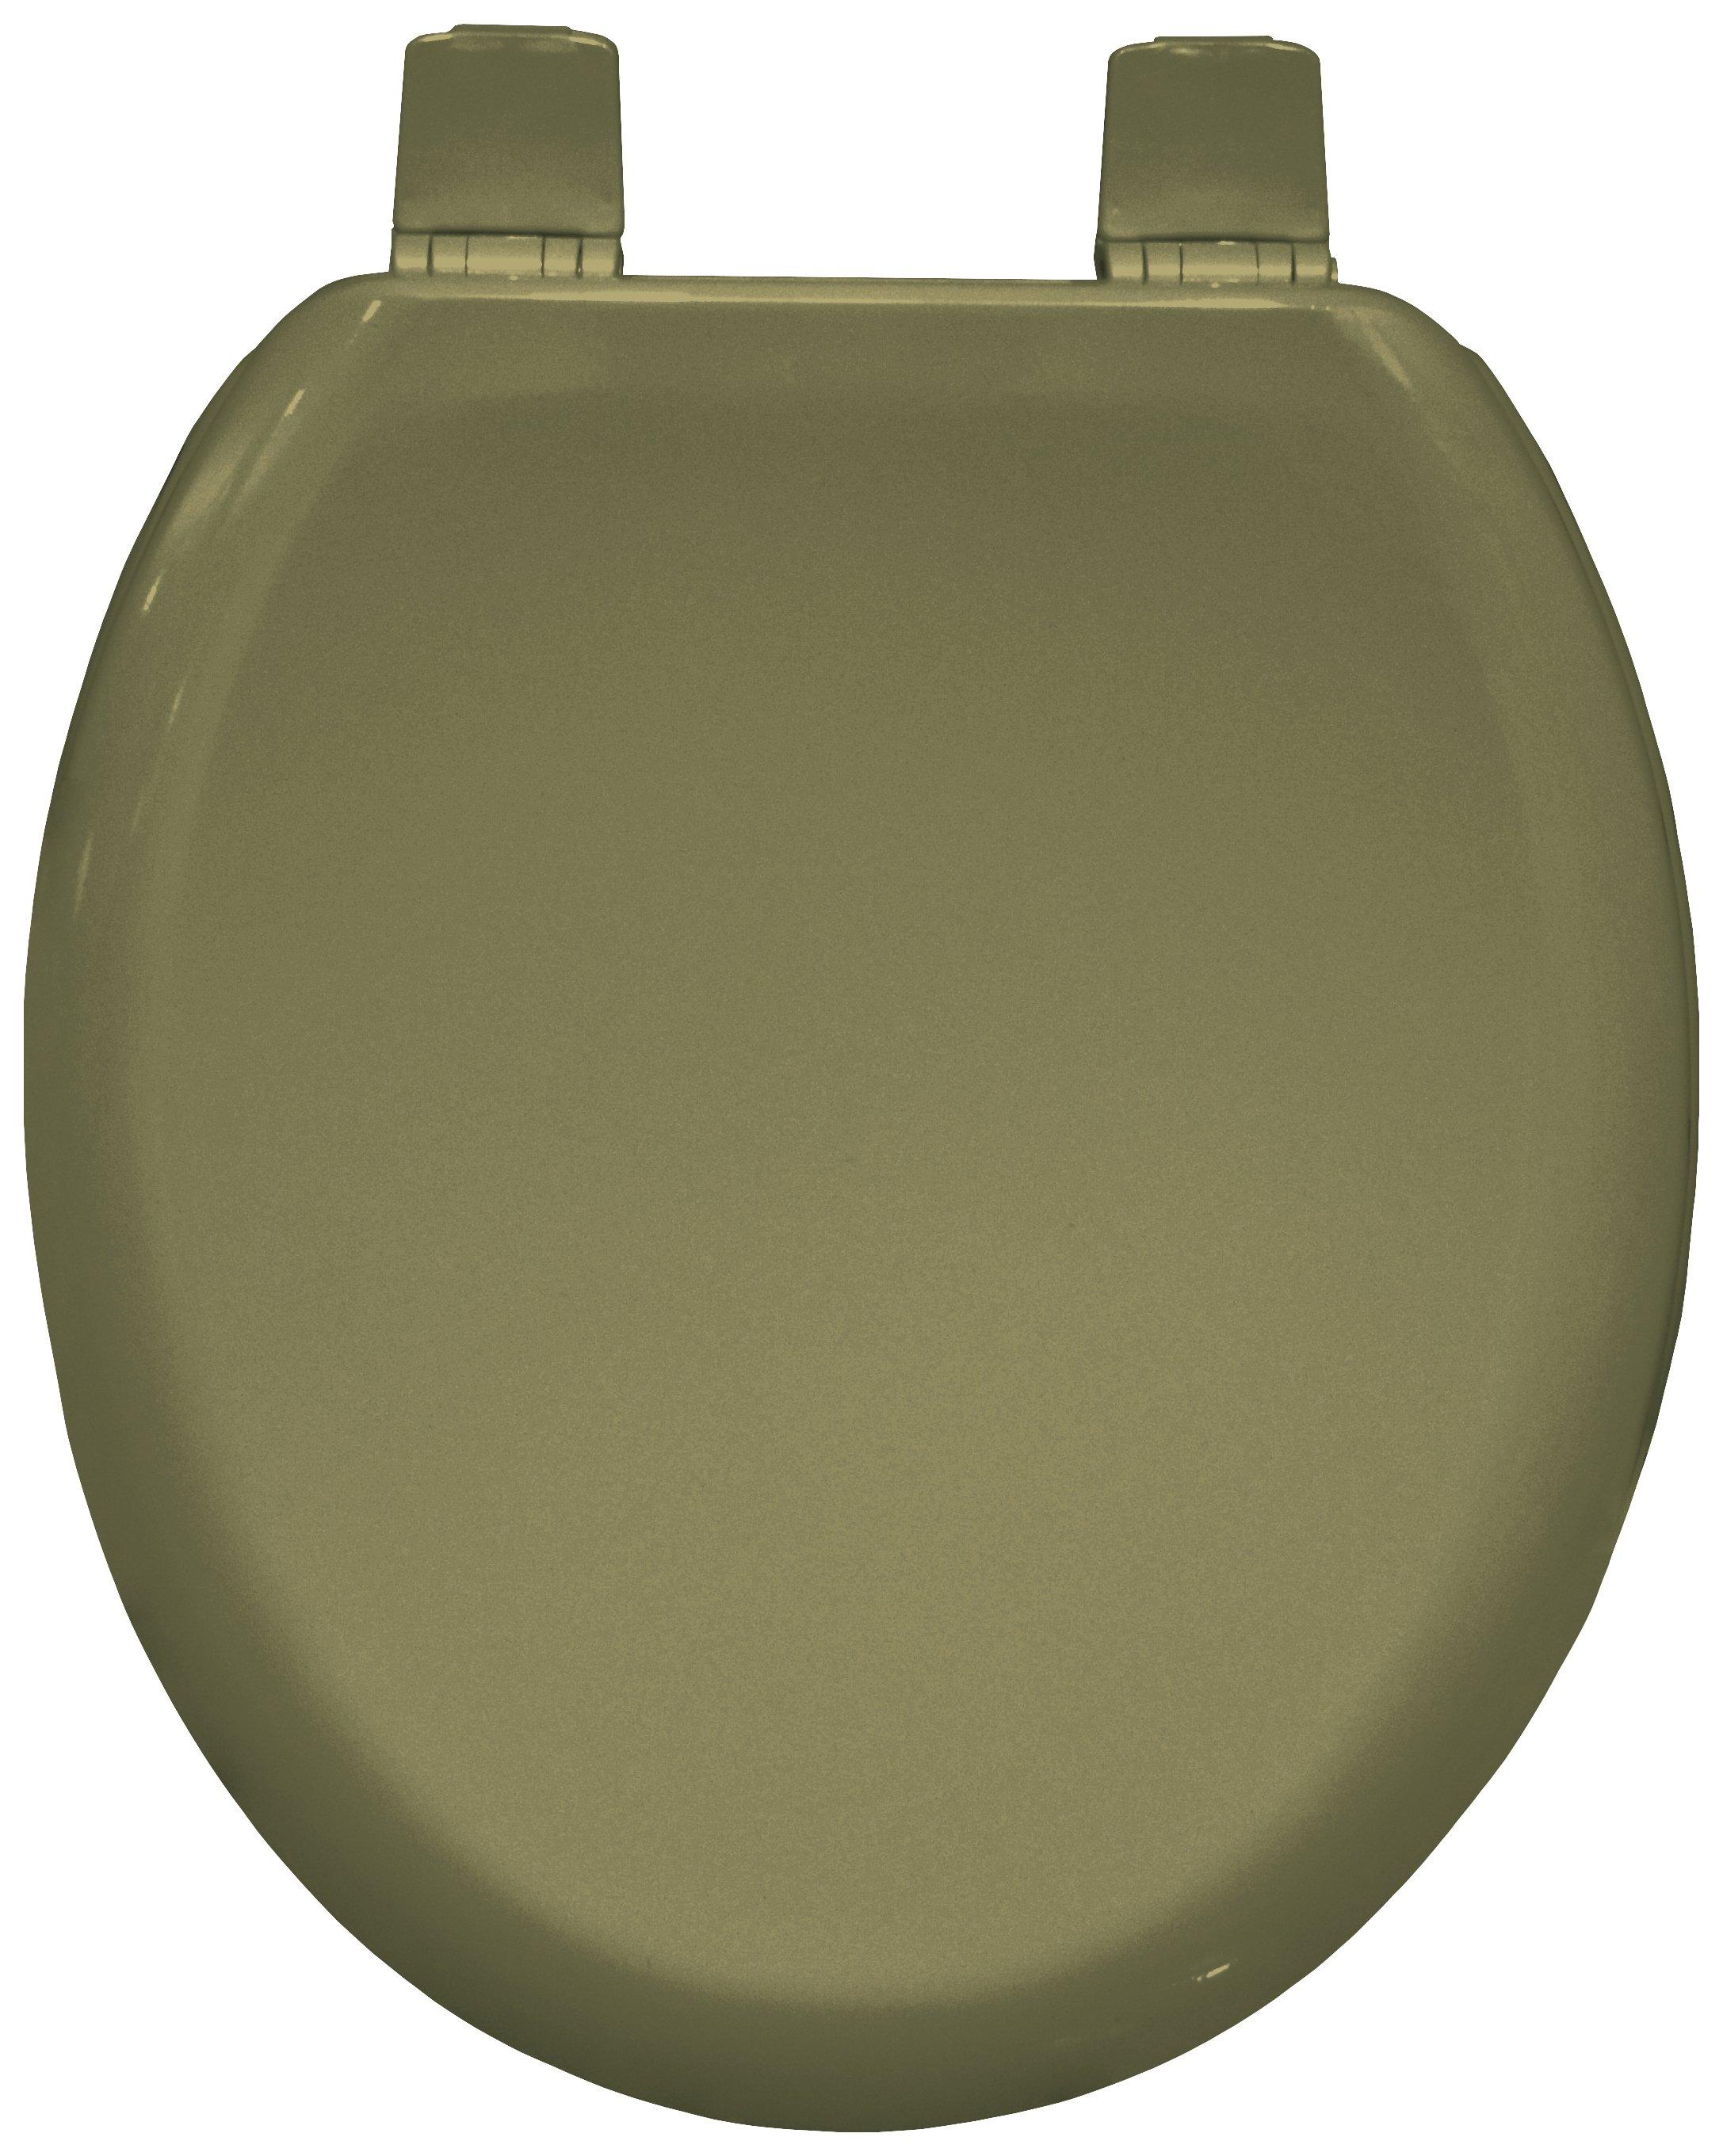 Bemis Chicago Moulded Wood Statite Toilet Seat - Soft Cream